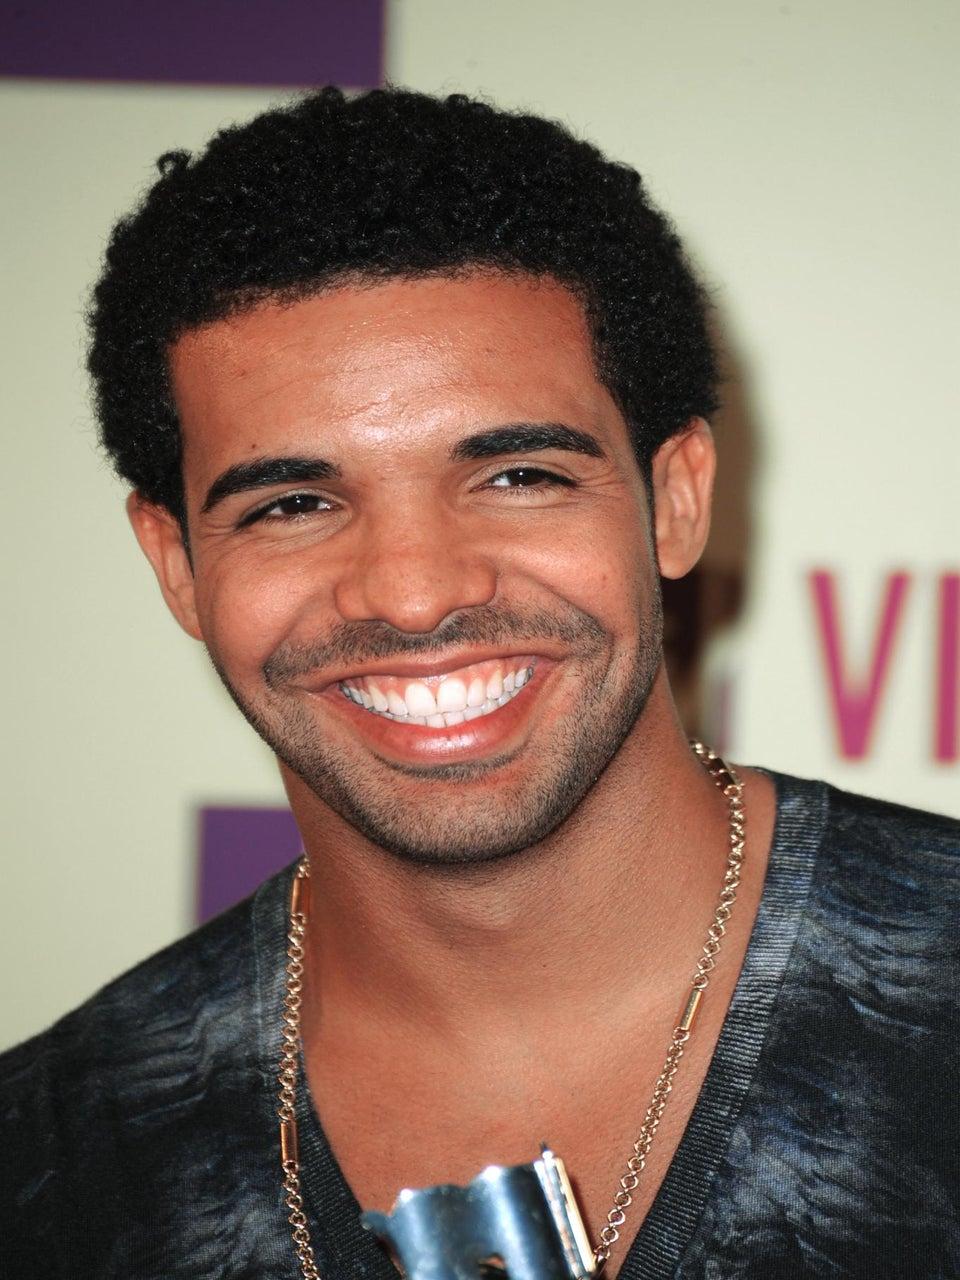 Coffee Talk: Drake Graduates High School, Tweets Excitement